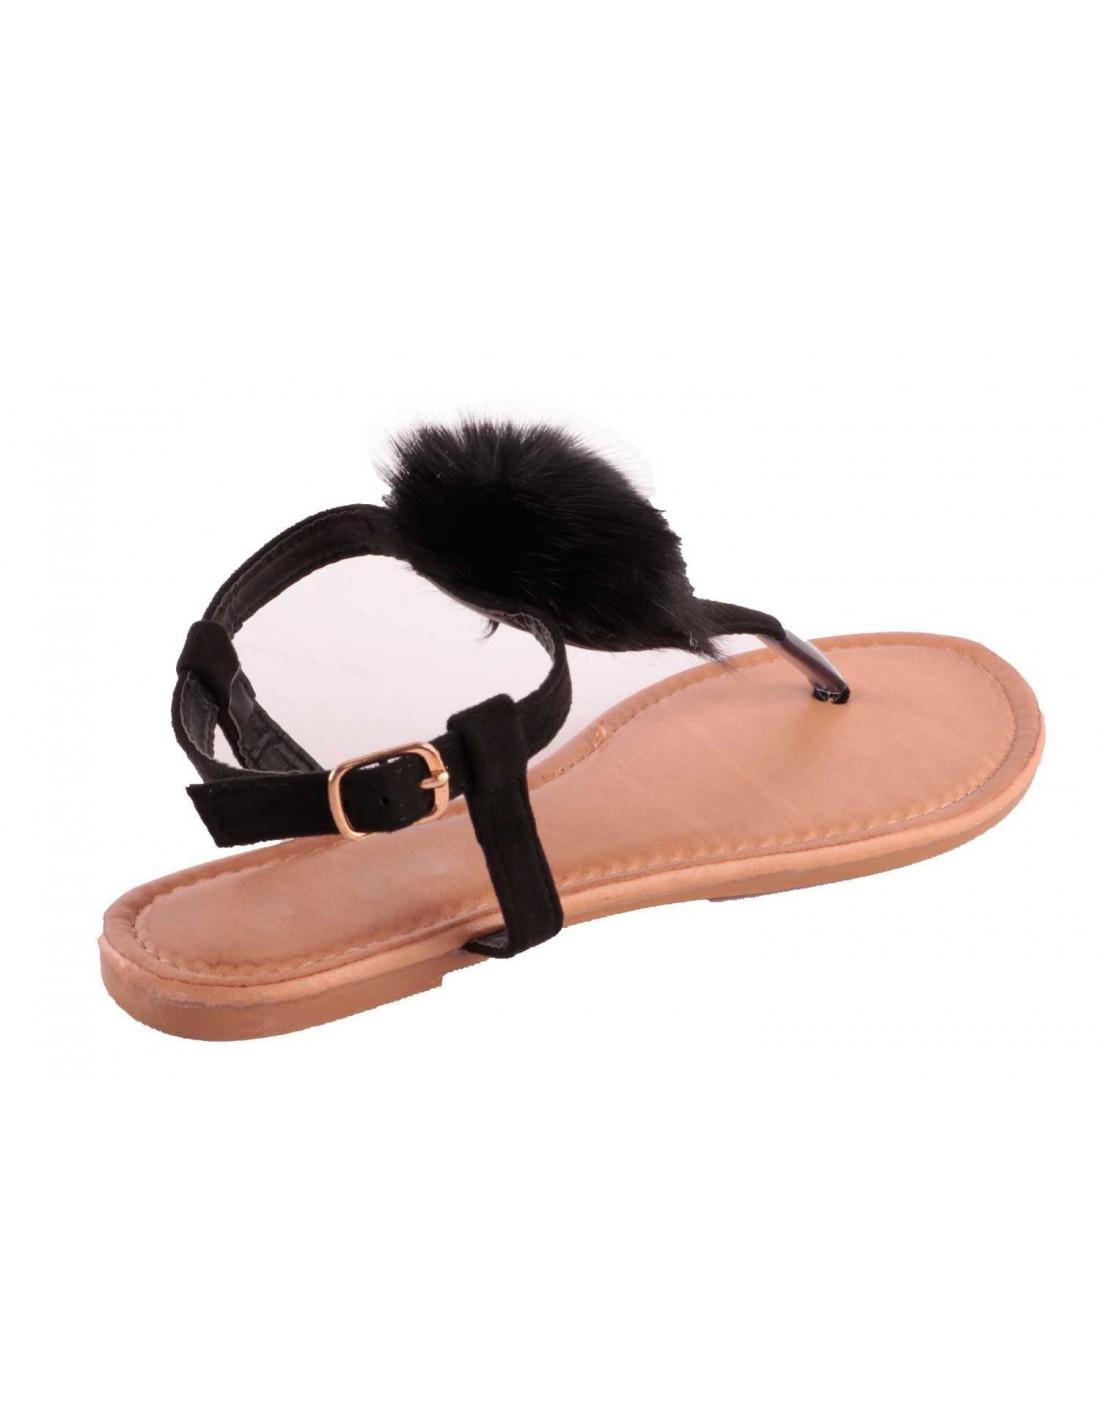 sandales femme noir pompon fourrure synth tique noir sandale plage. Black Bedroom Furniture Sets. Home Design Ideas